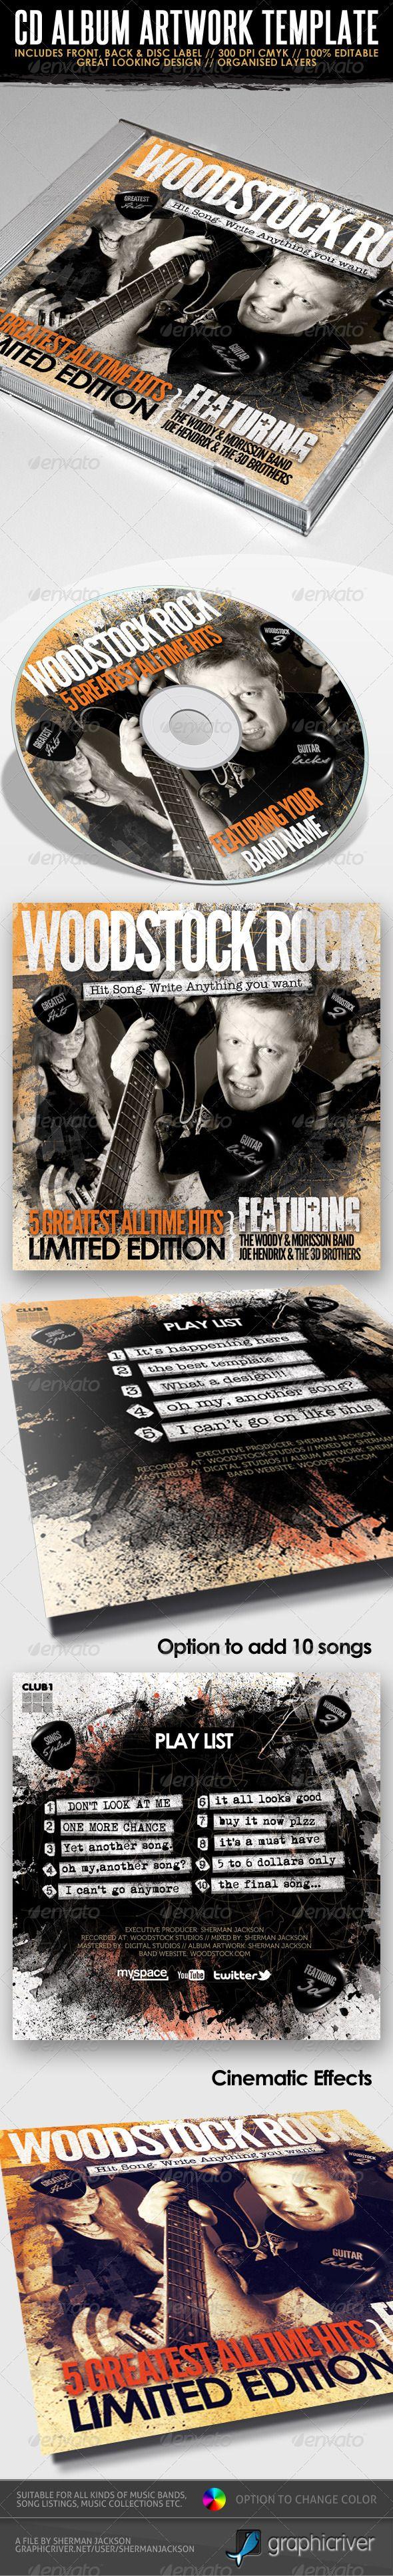 Woodstock Rock Compilation CD #Artwork #PSD - #CD & DVD #Artwork #Print #Templates Download here: https://graphicriver.net/item/woodstock-rock-compilation-cd-artwork-psd/2492902?ref=alena994